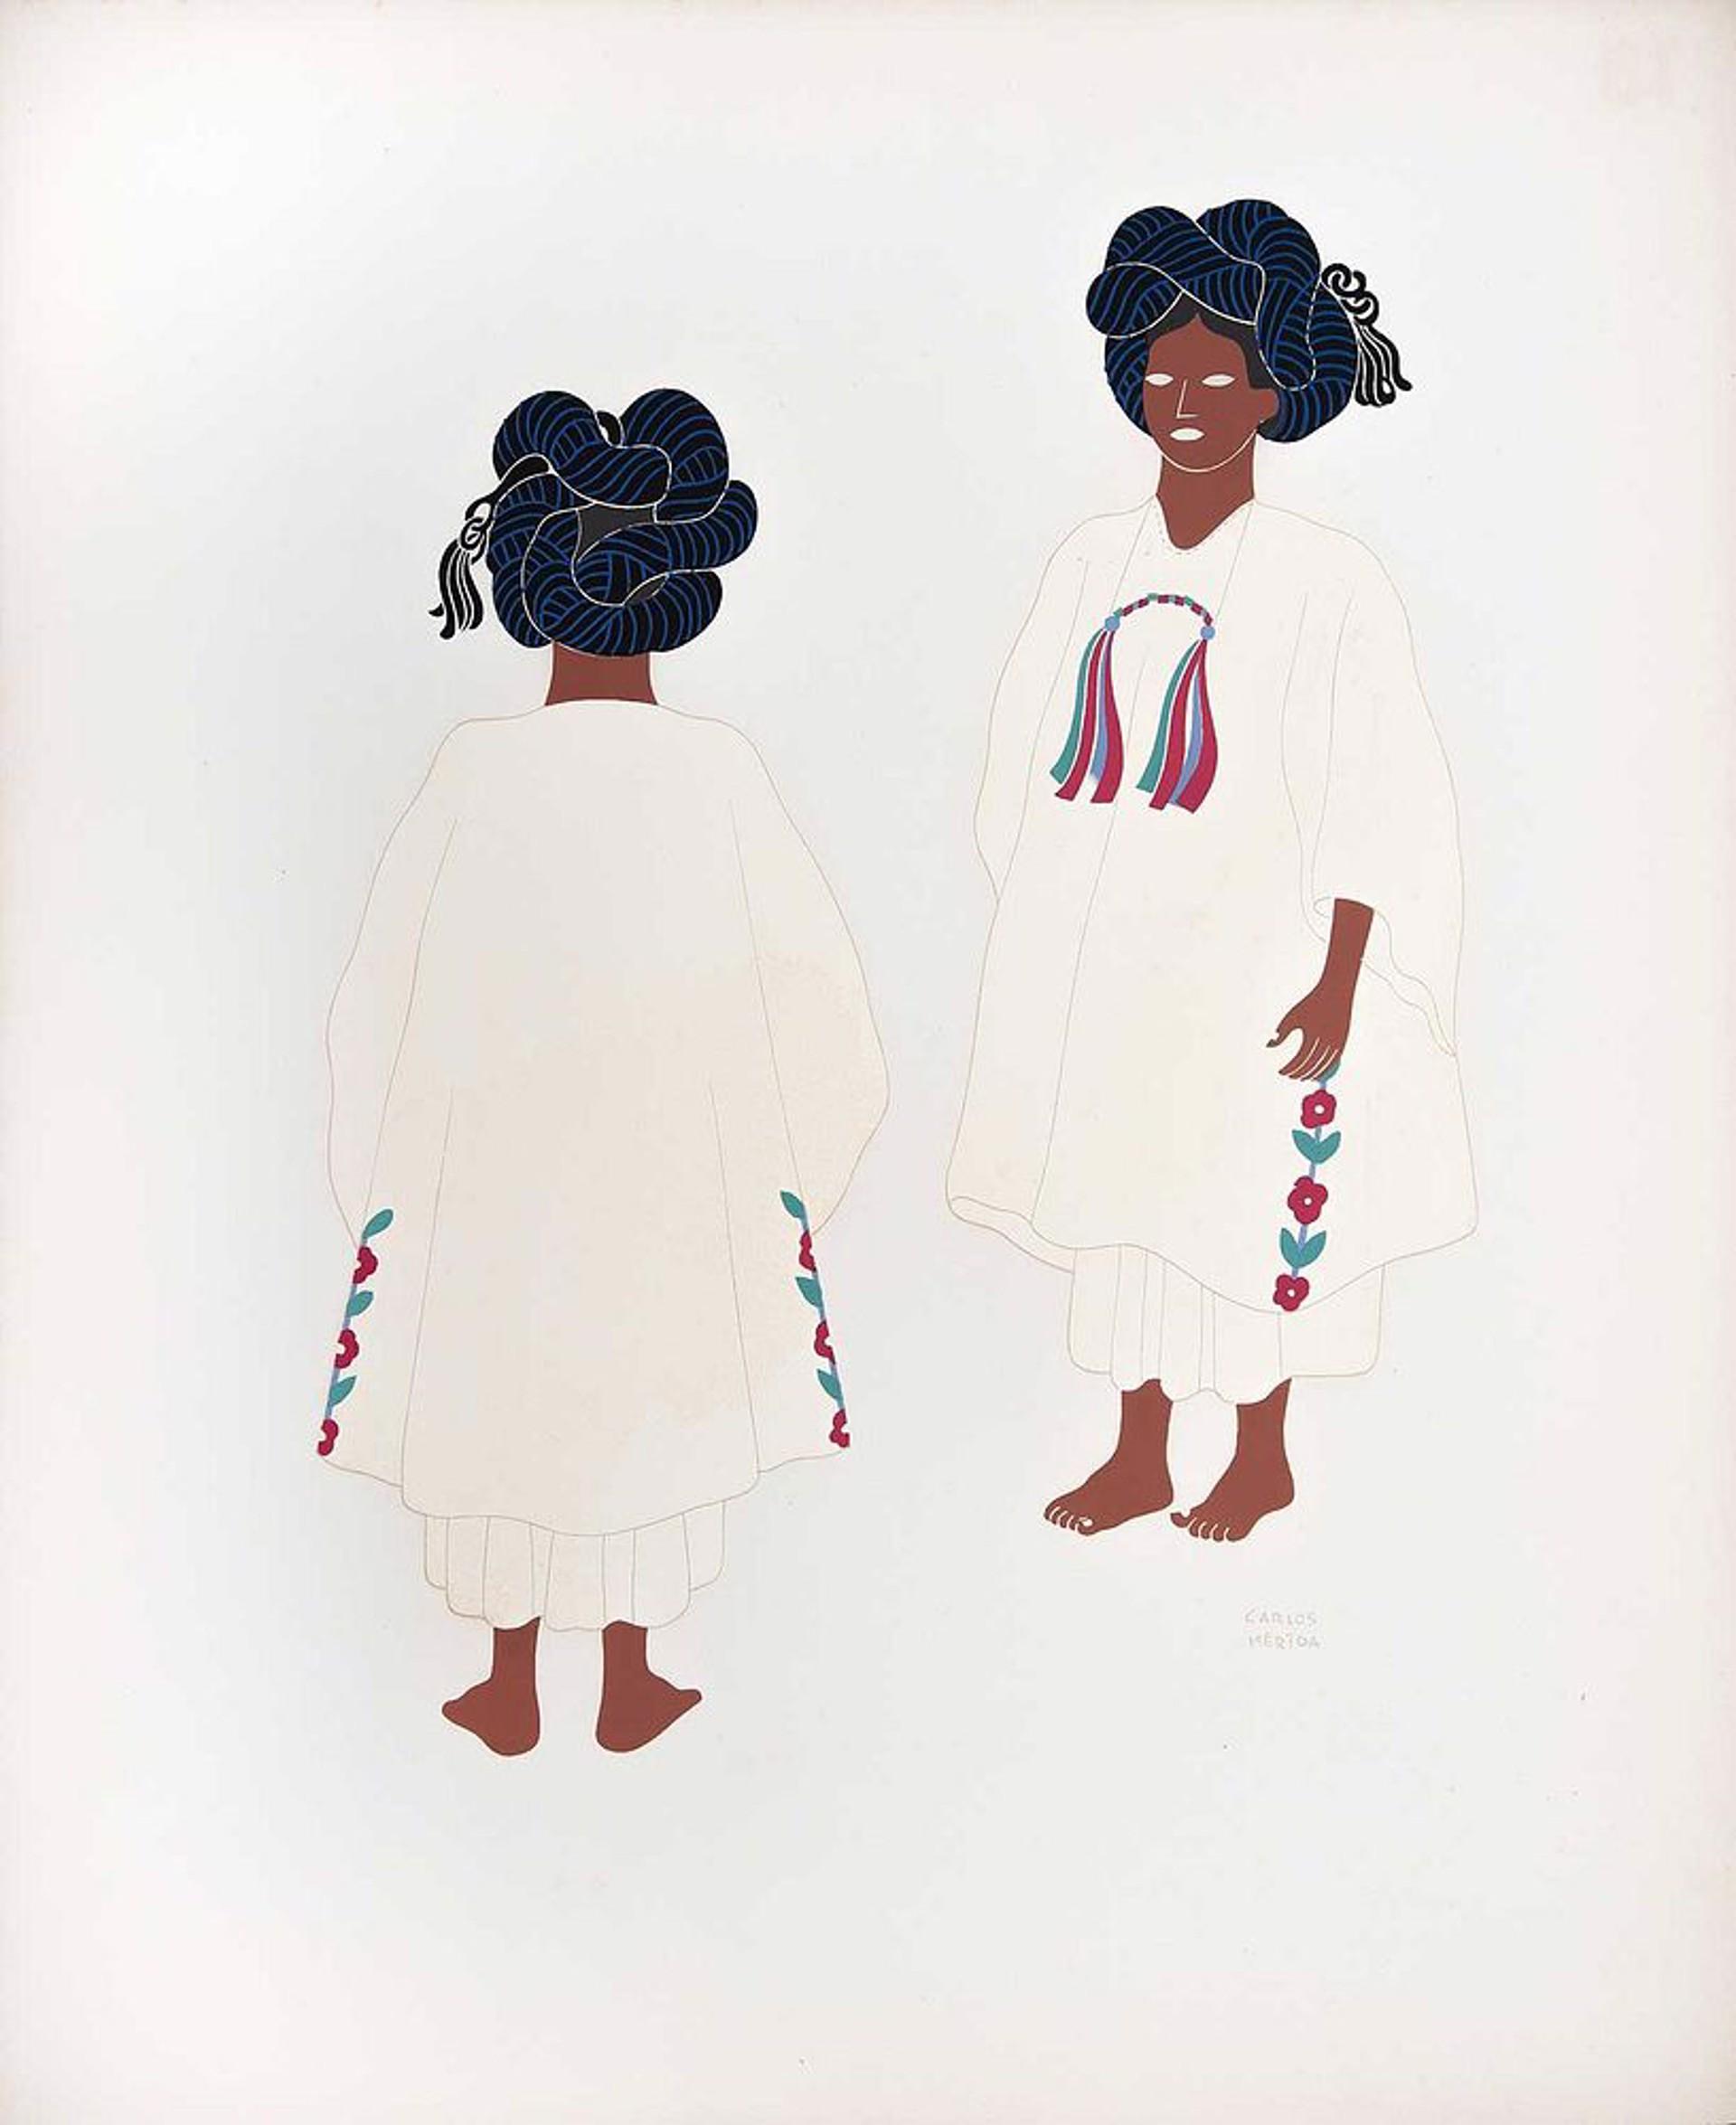 Yalatecs of the State of Oaxaca by Carlos Mérida (1891 - 1985)